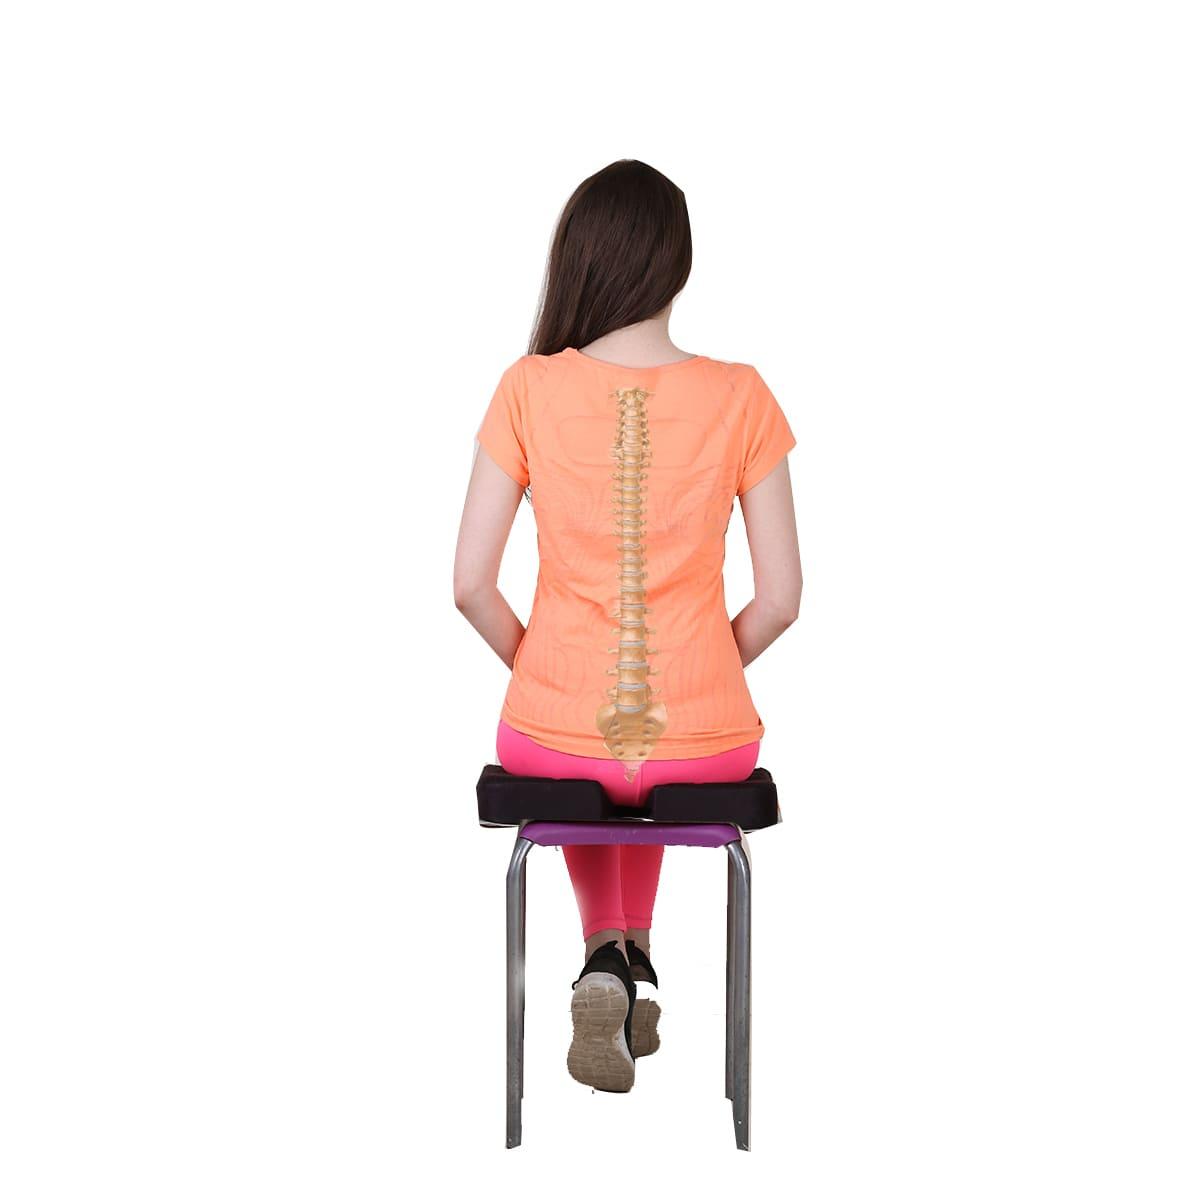 coccyx cushion seat for tailbone pain